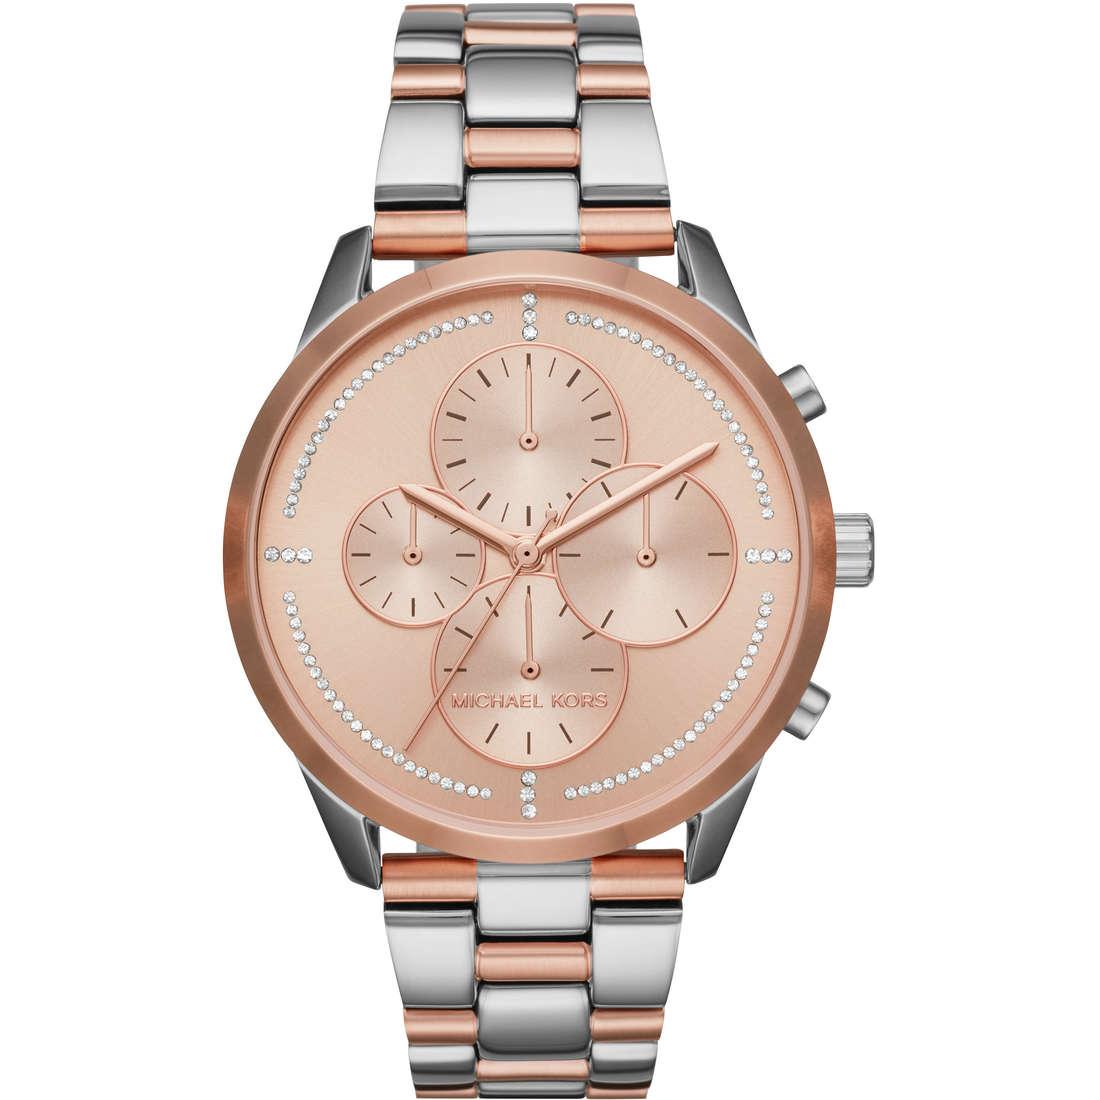 c30fb33441 Orologio cronografo donna Michael Kors Slater MK6520